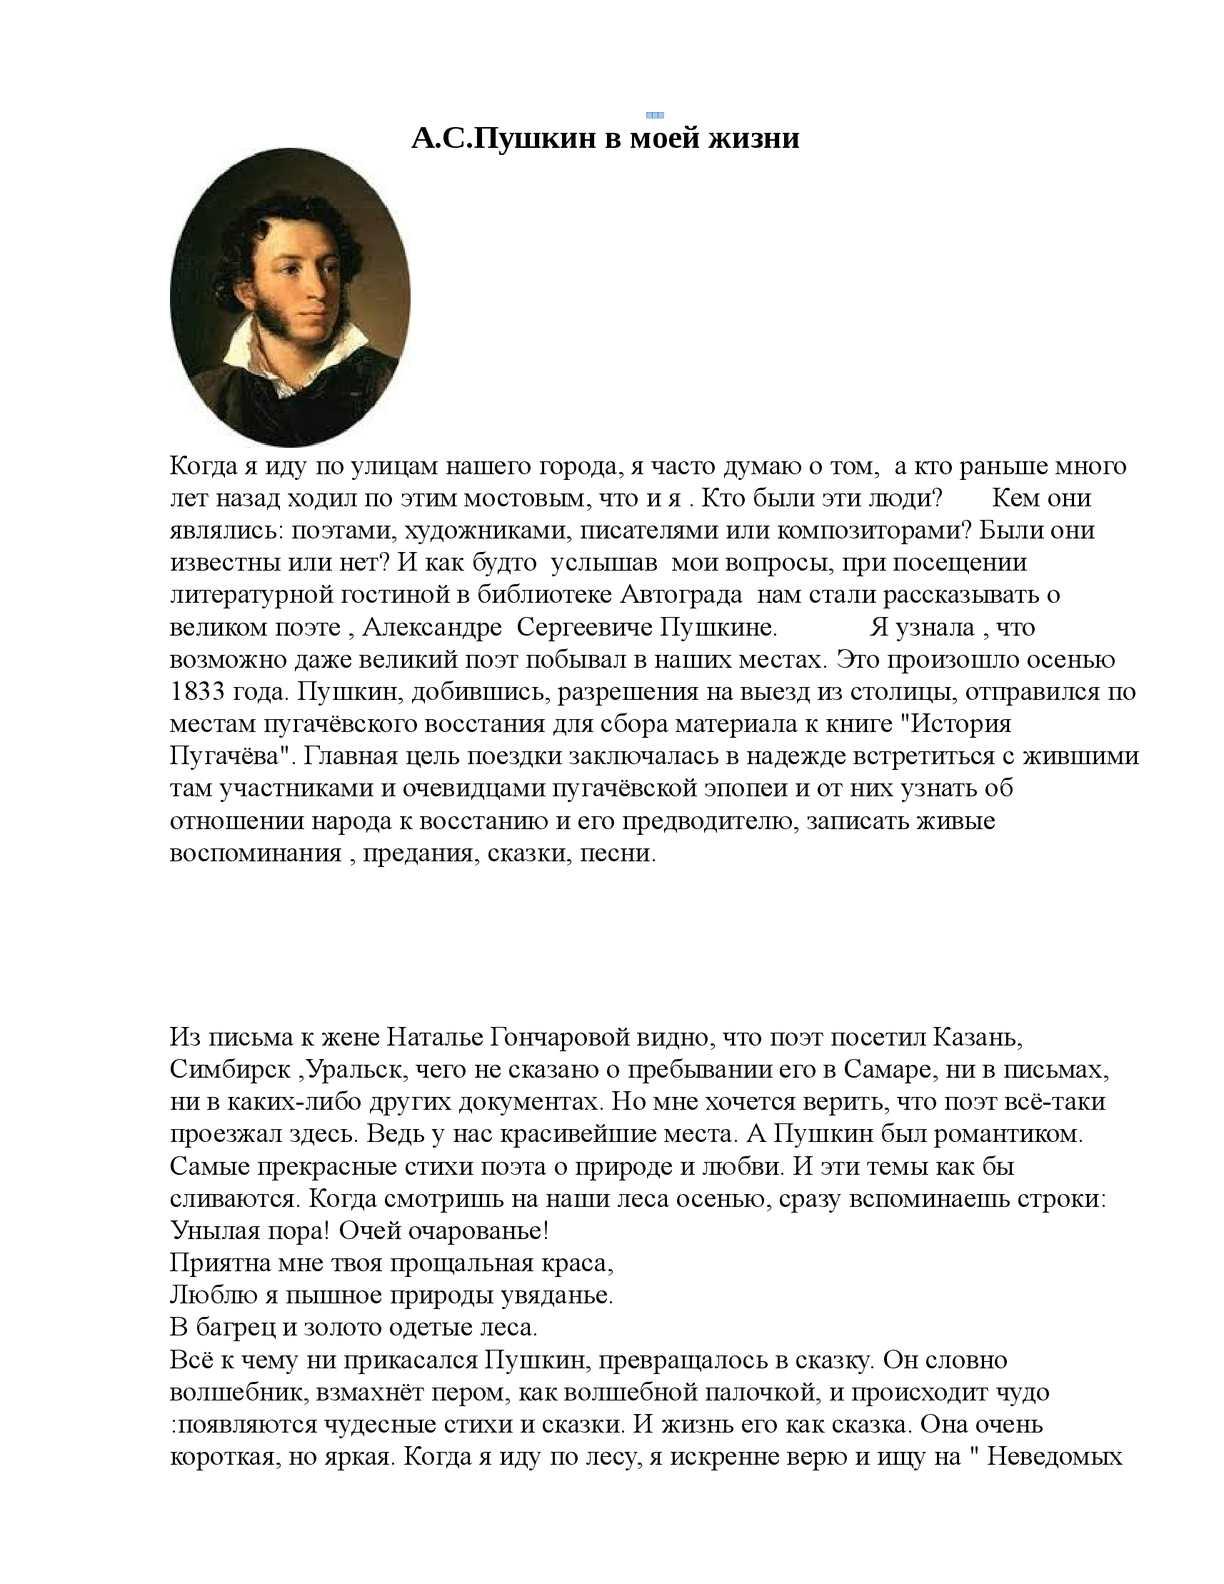 Пушкин в моей жизни эссе 8889